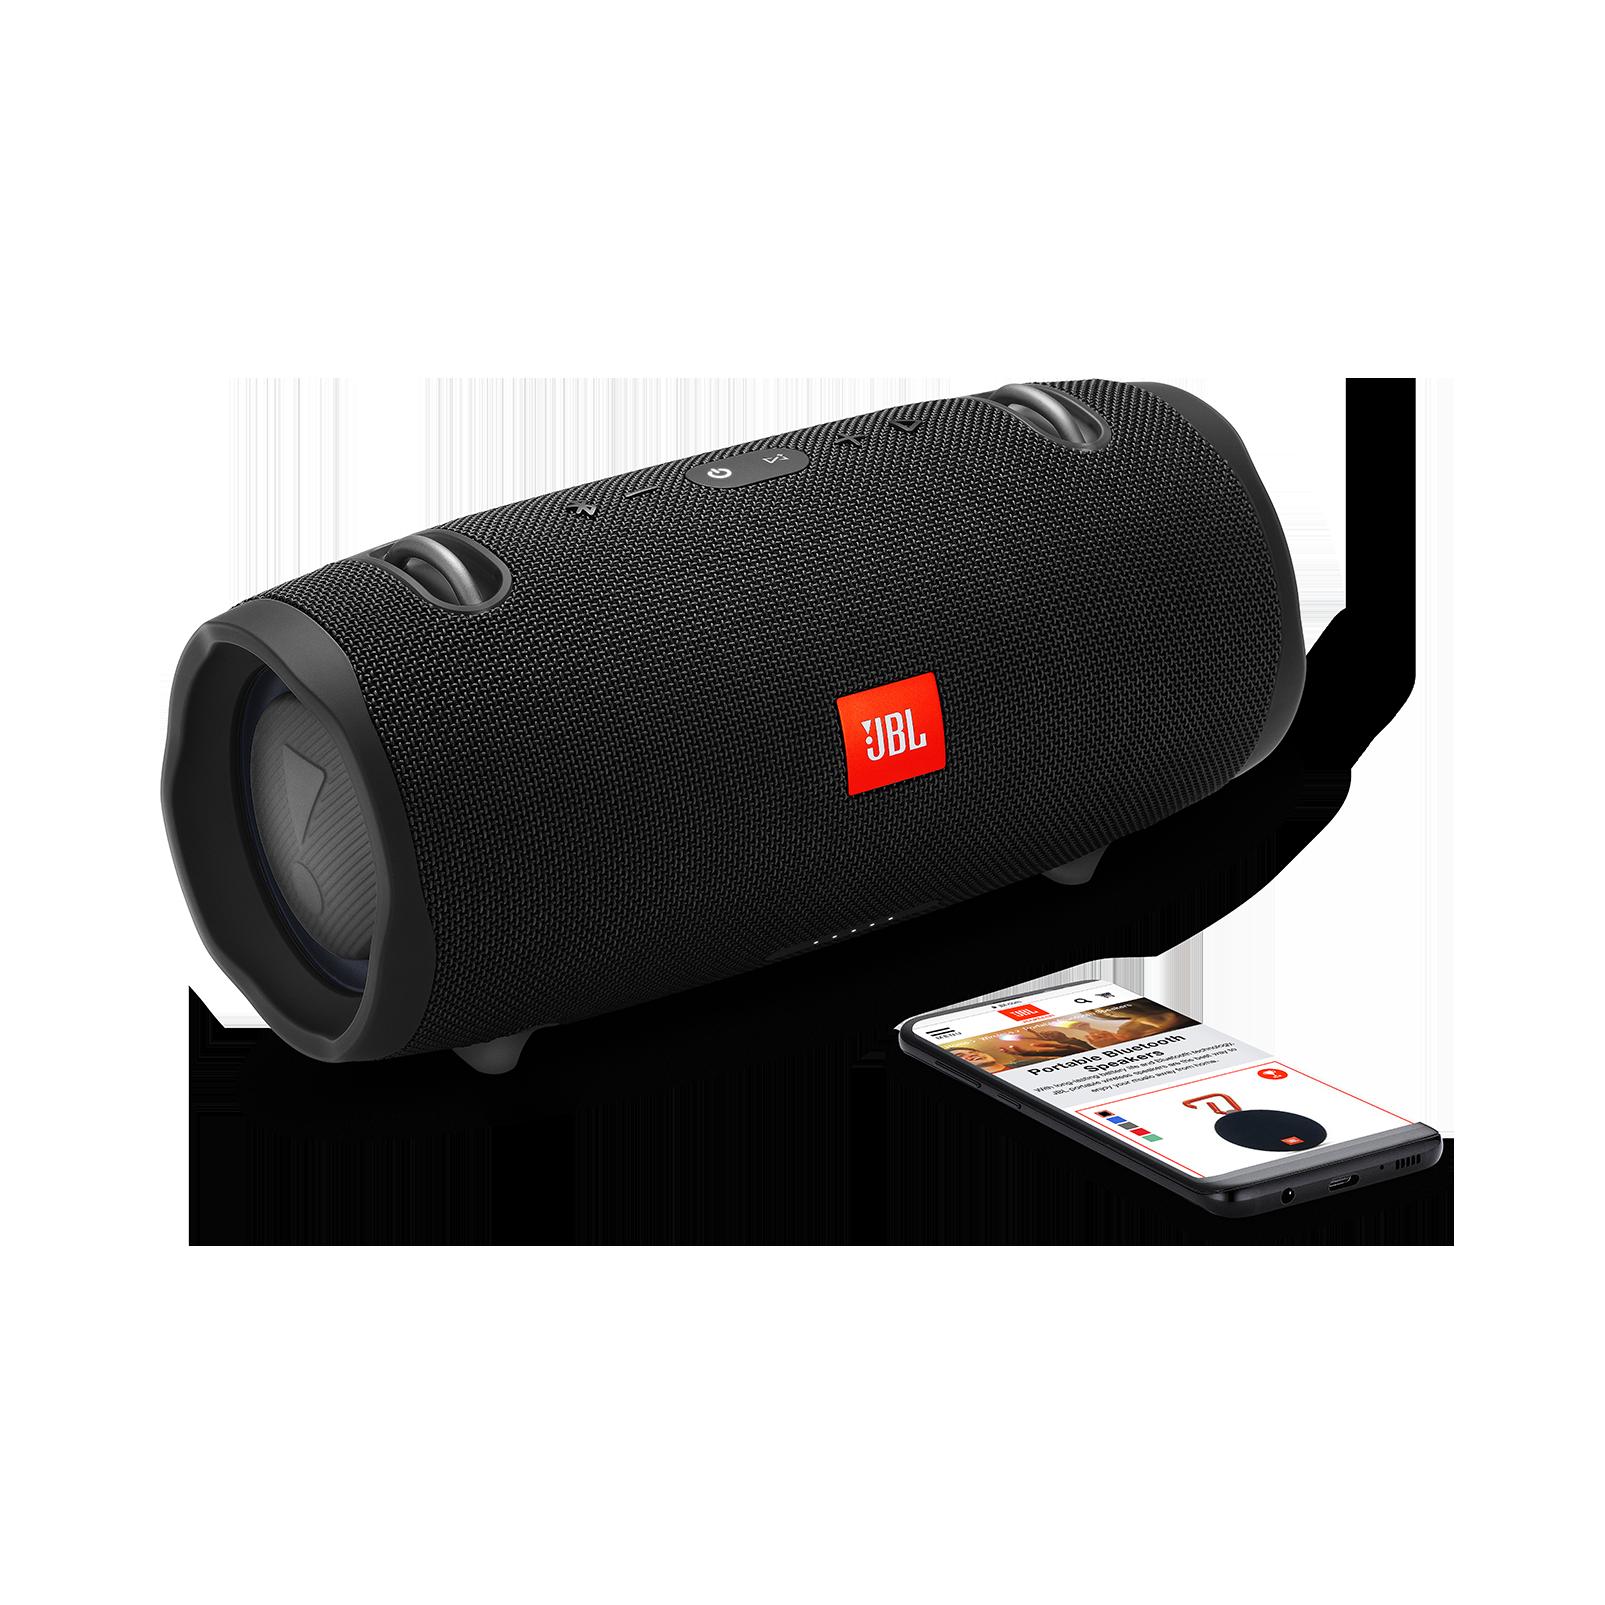 JBL Xtreme 2 - Midnight Black - Portable Bluetooth Speaker - Detailshot 1